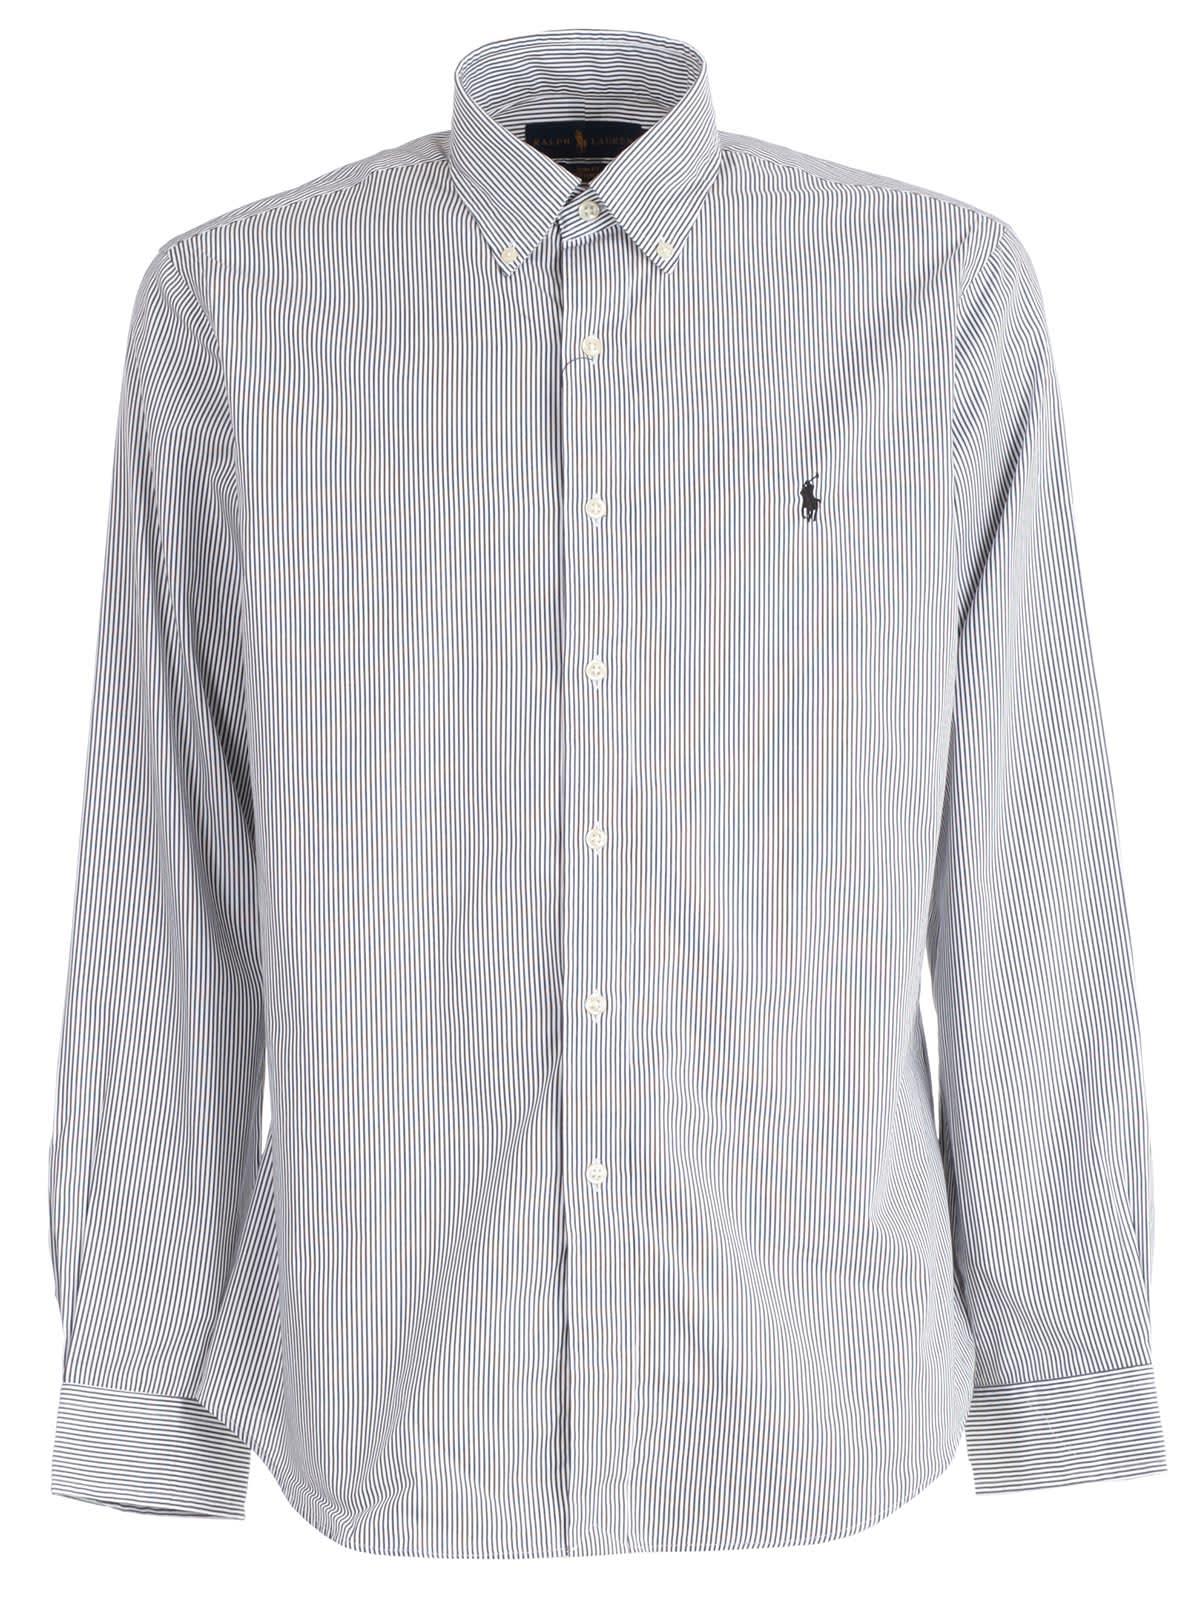 Shirt Lauren Polo Shirt Ralph Striped Polo Lauren Ralph Striped Polo D9IWY2EH